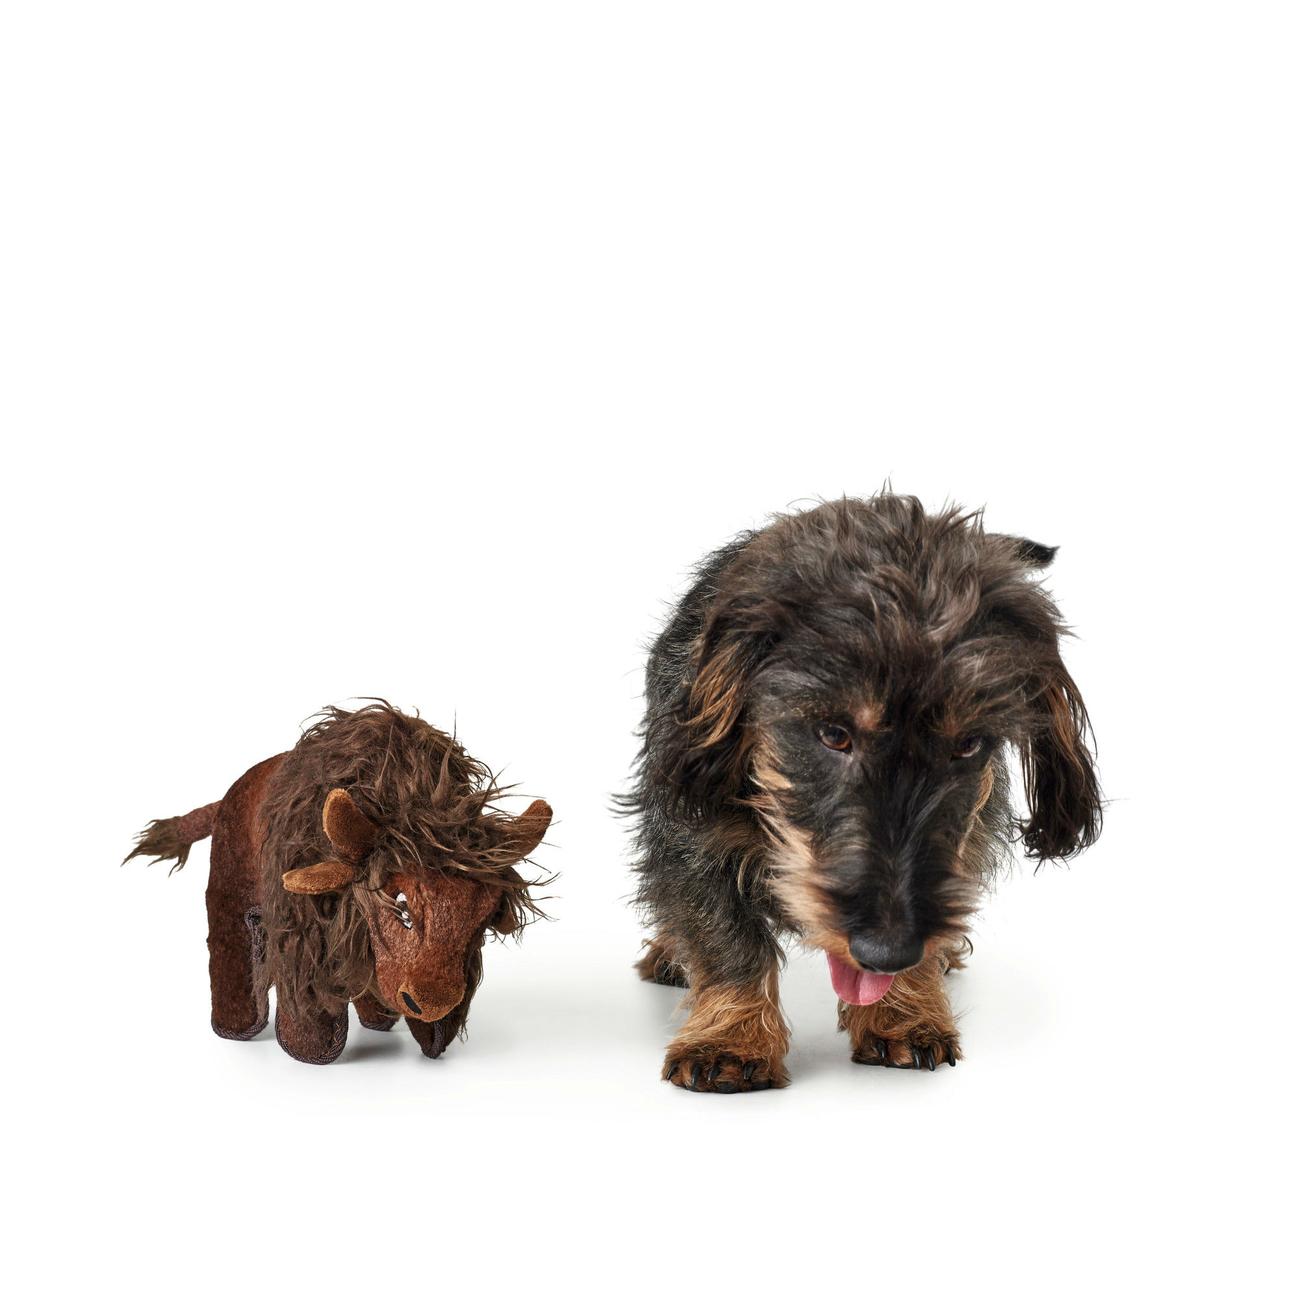 Hunter Hundespielzeug Tough Kamerun Stofftier 65719, Bild 9